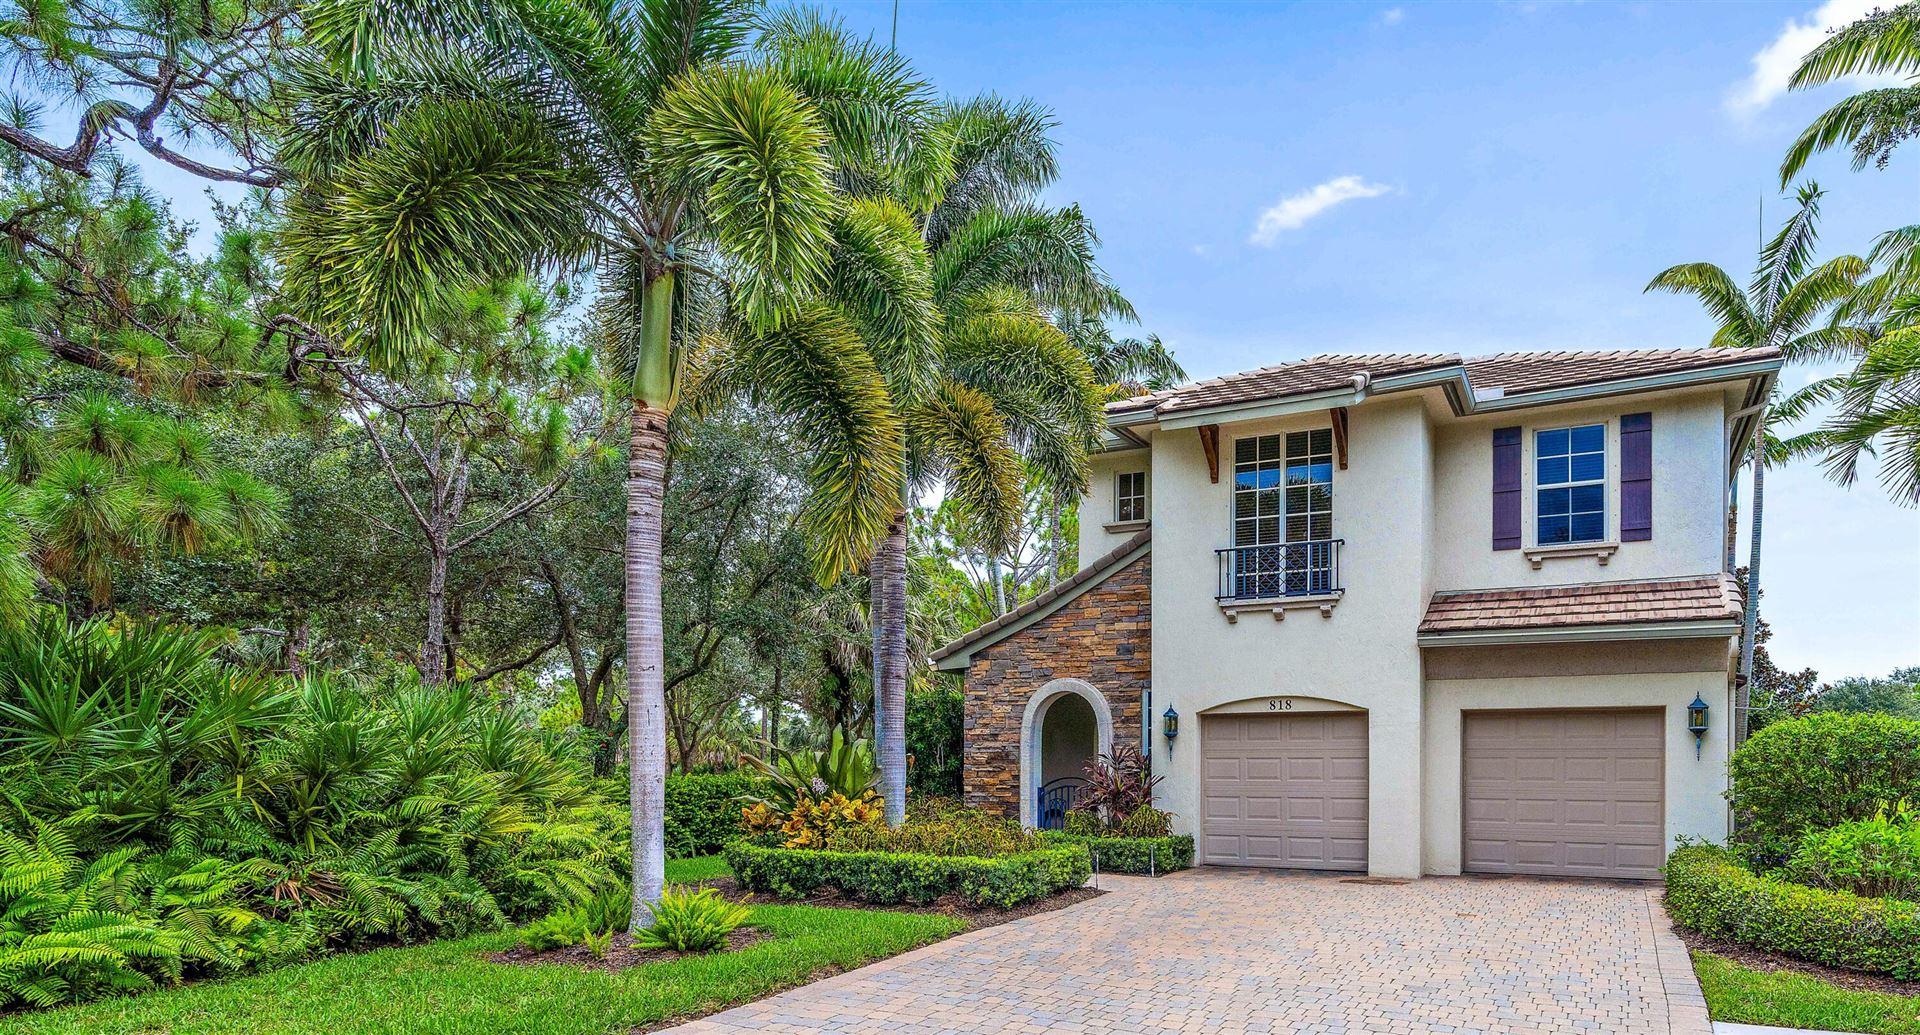 Photo of 818 Lincoln Court, Palm Beach Gardens, FL 33410 (MLS # RX-10726967)